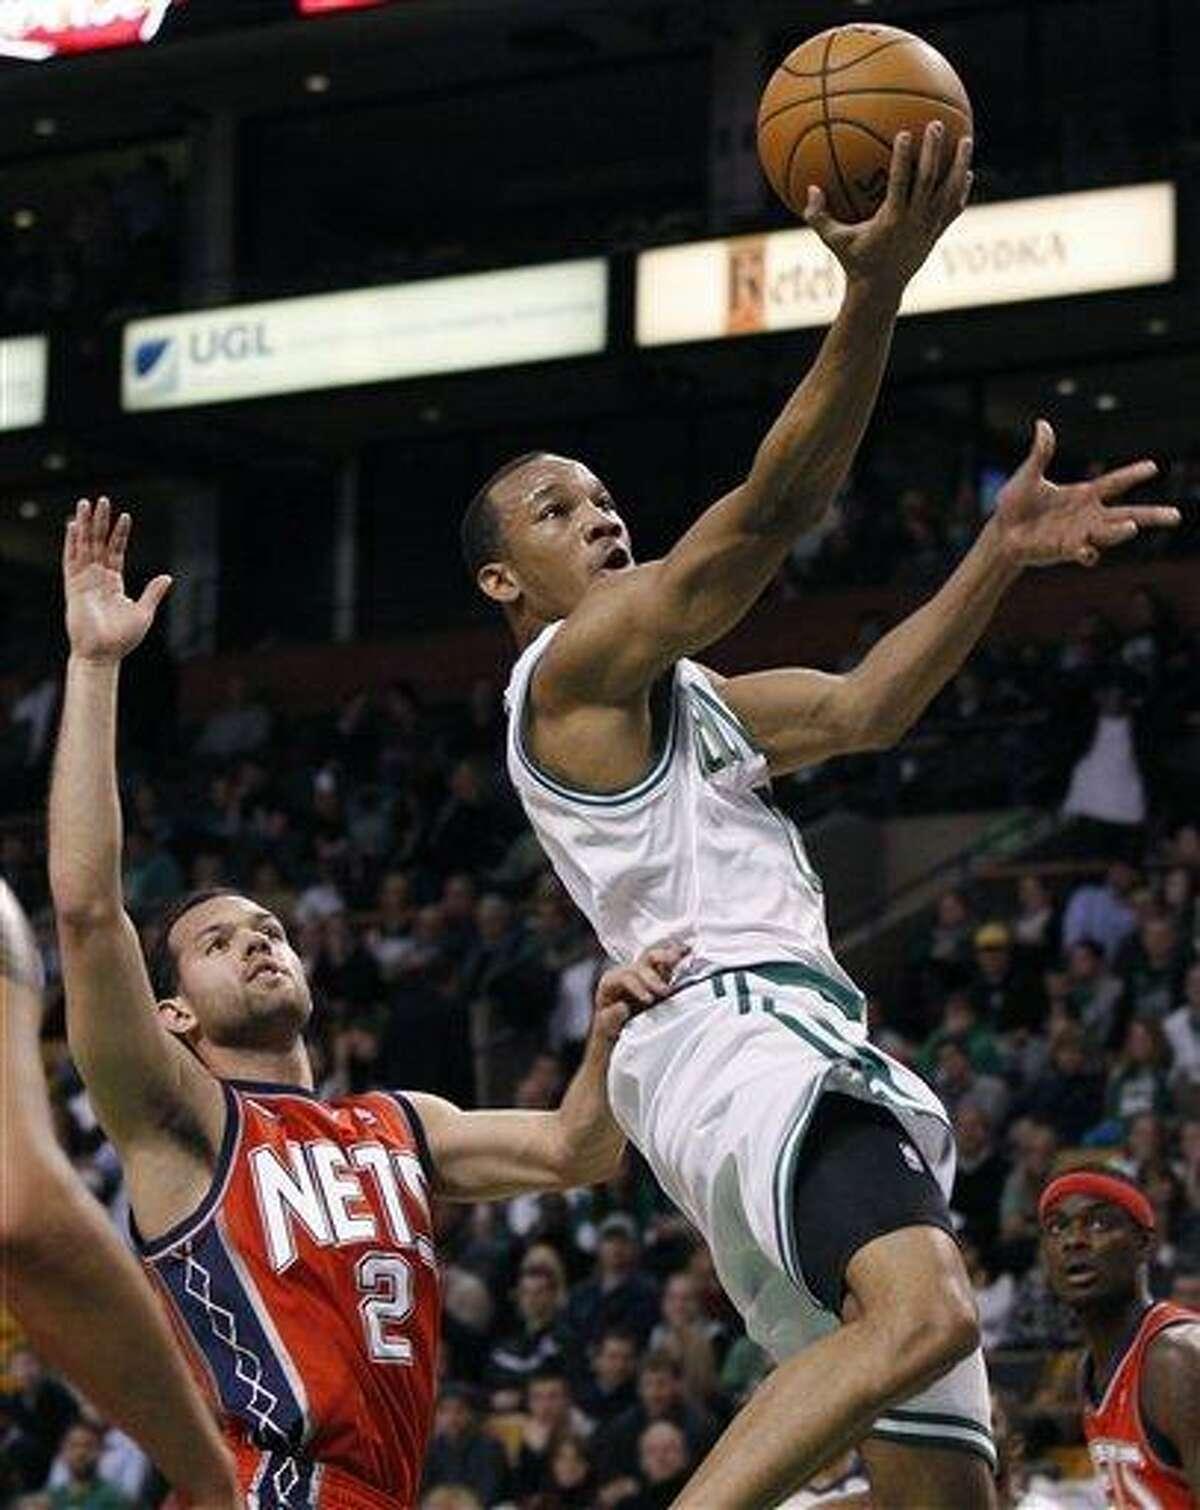 Boston Celtics guard Avery Bradley drives past New Jersey Nets guard Jordan Farmar (2) in the second half of an NBA basketball game in Boston, Wednesday, Jan. 4, 2012. The Celtics won 89-70. (AP Photo/Elise Amendola)